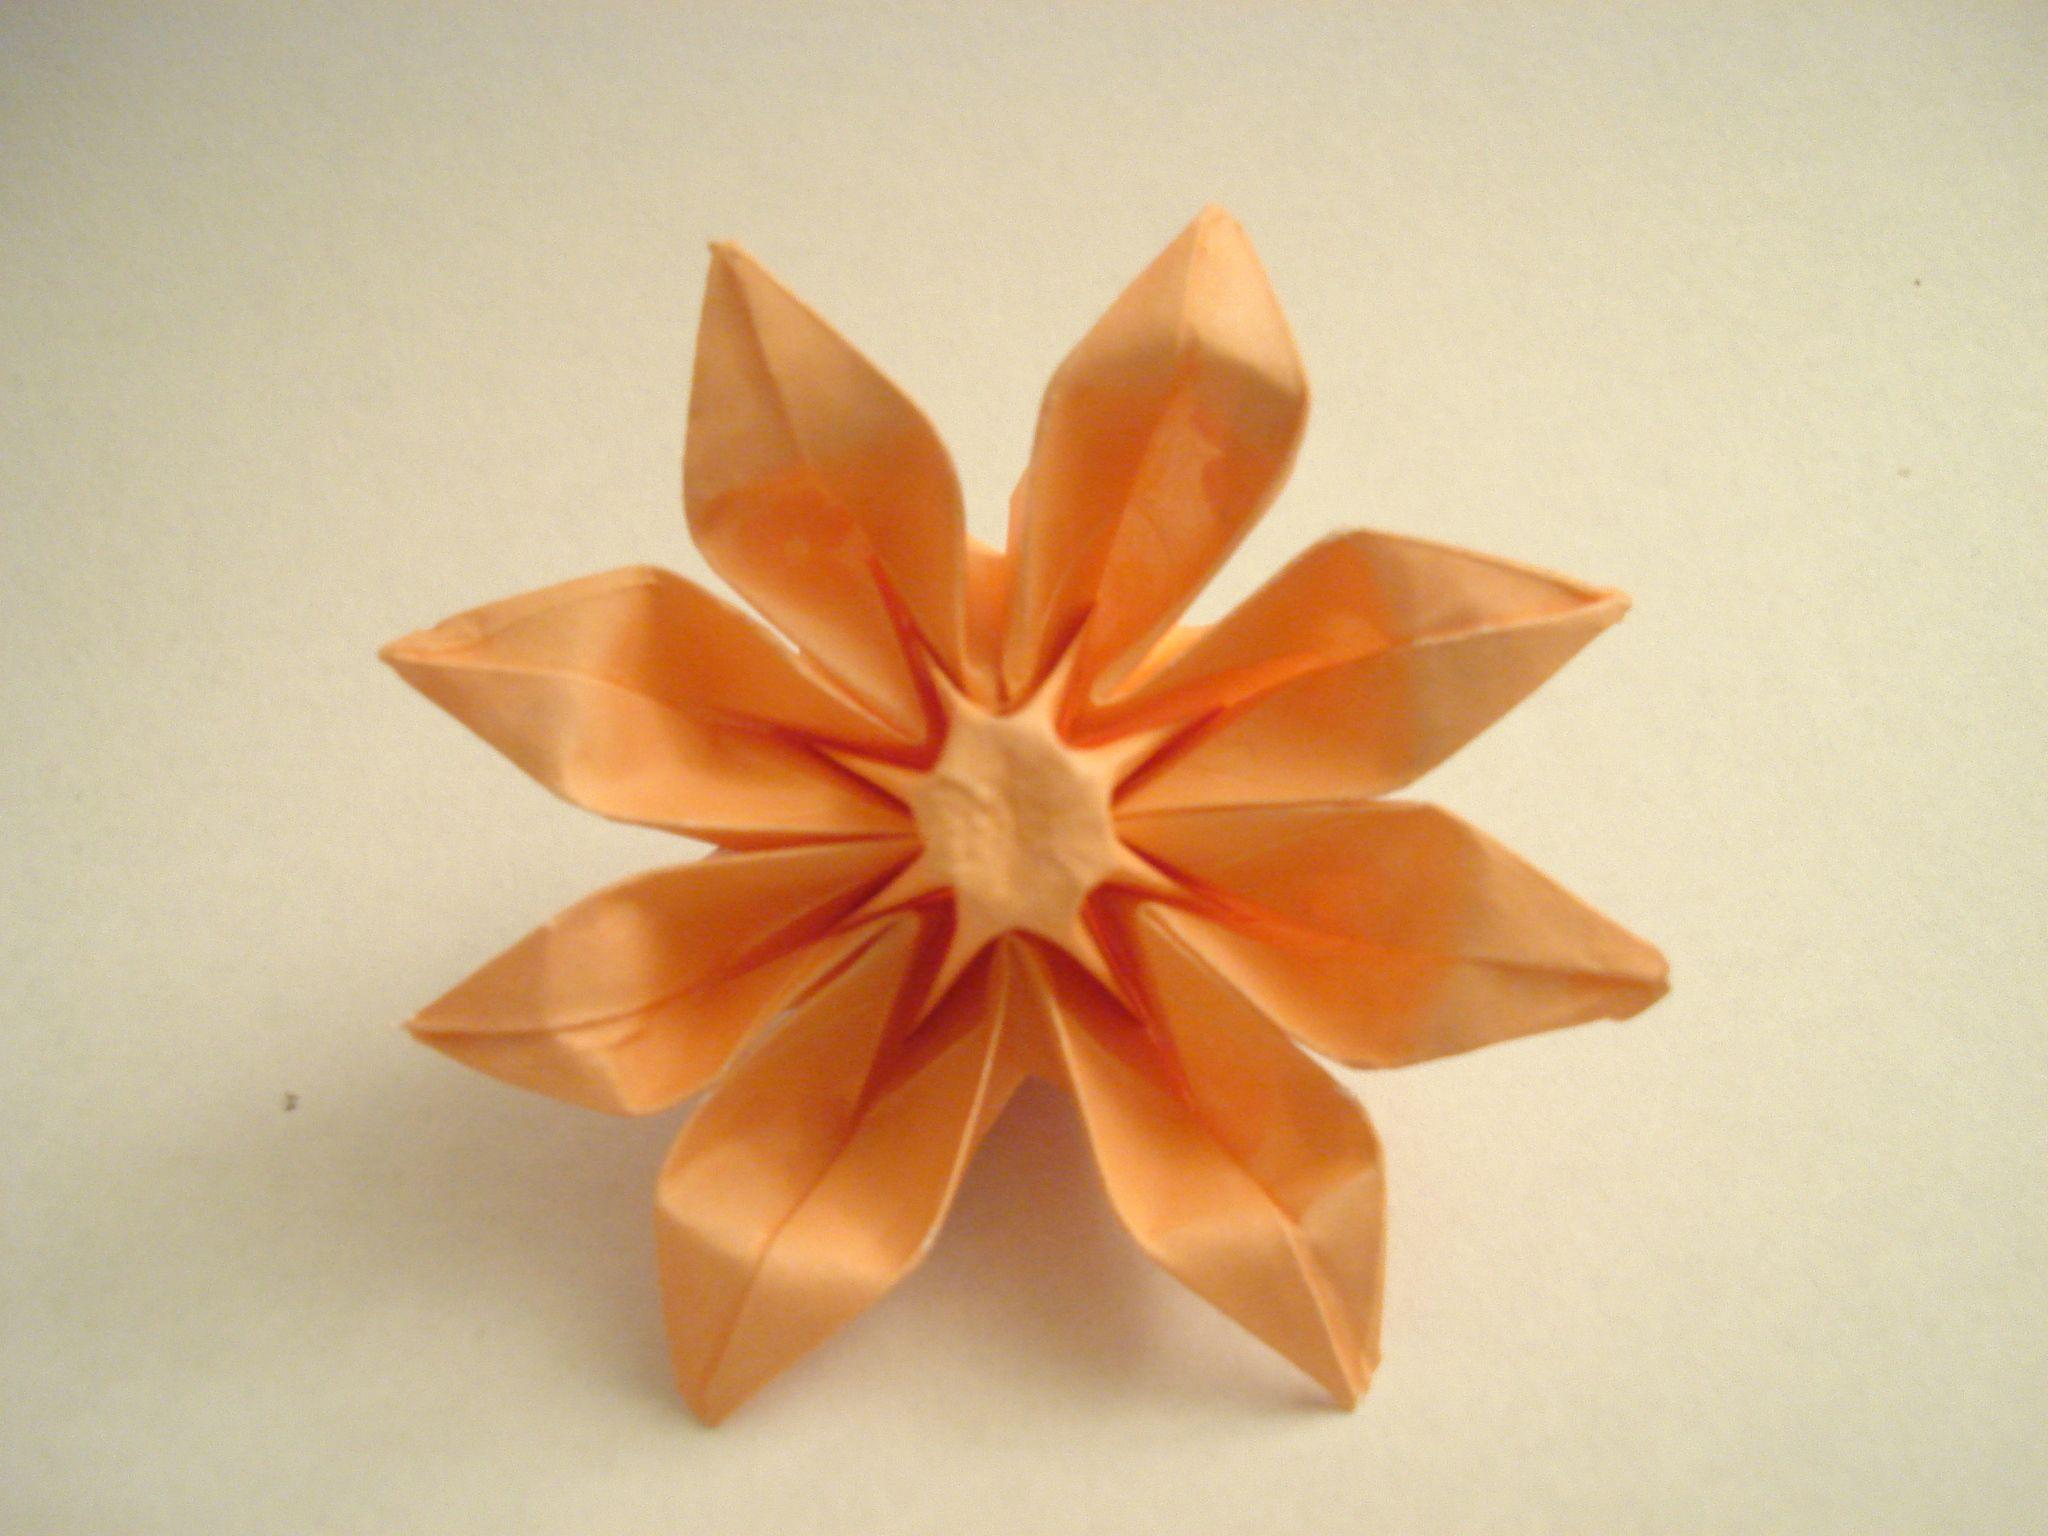 Origami Flowers Origami Pinterest Origami Flower And Oragami